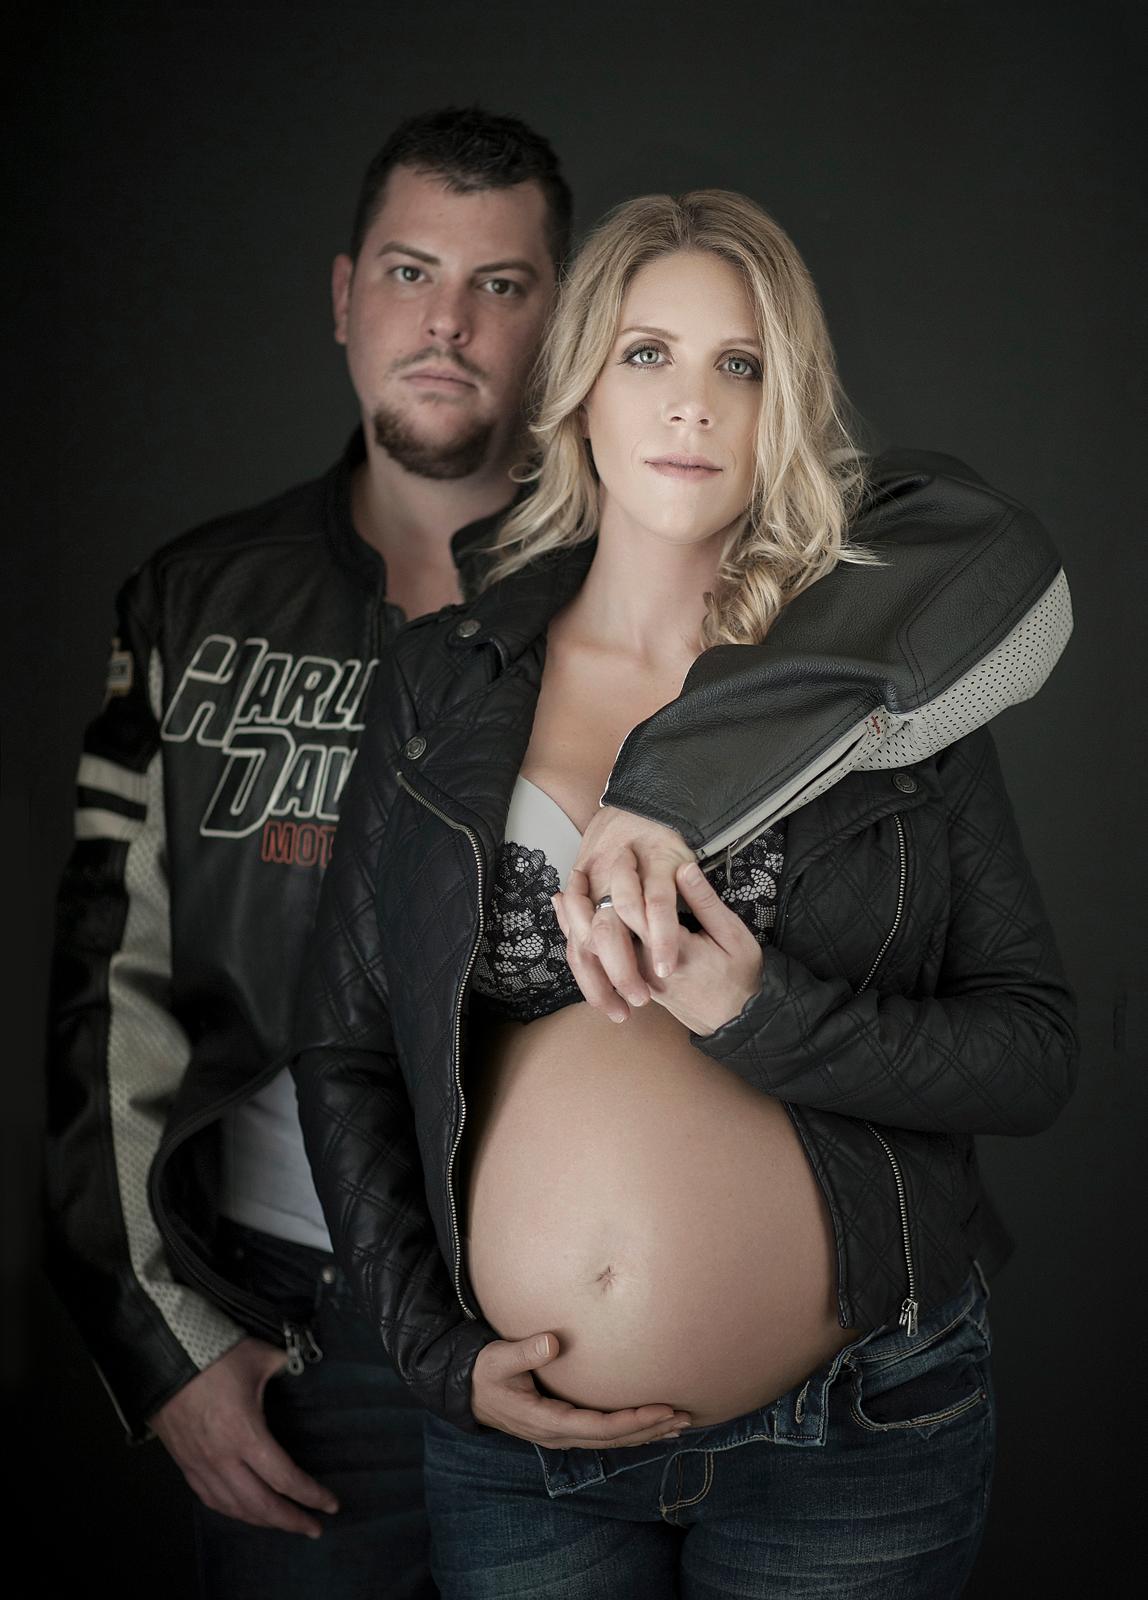 08-motorcycle-jacket-maternity-couple-badass-attitude-model-studio.jpg